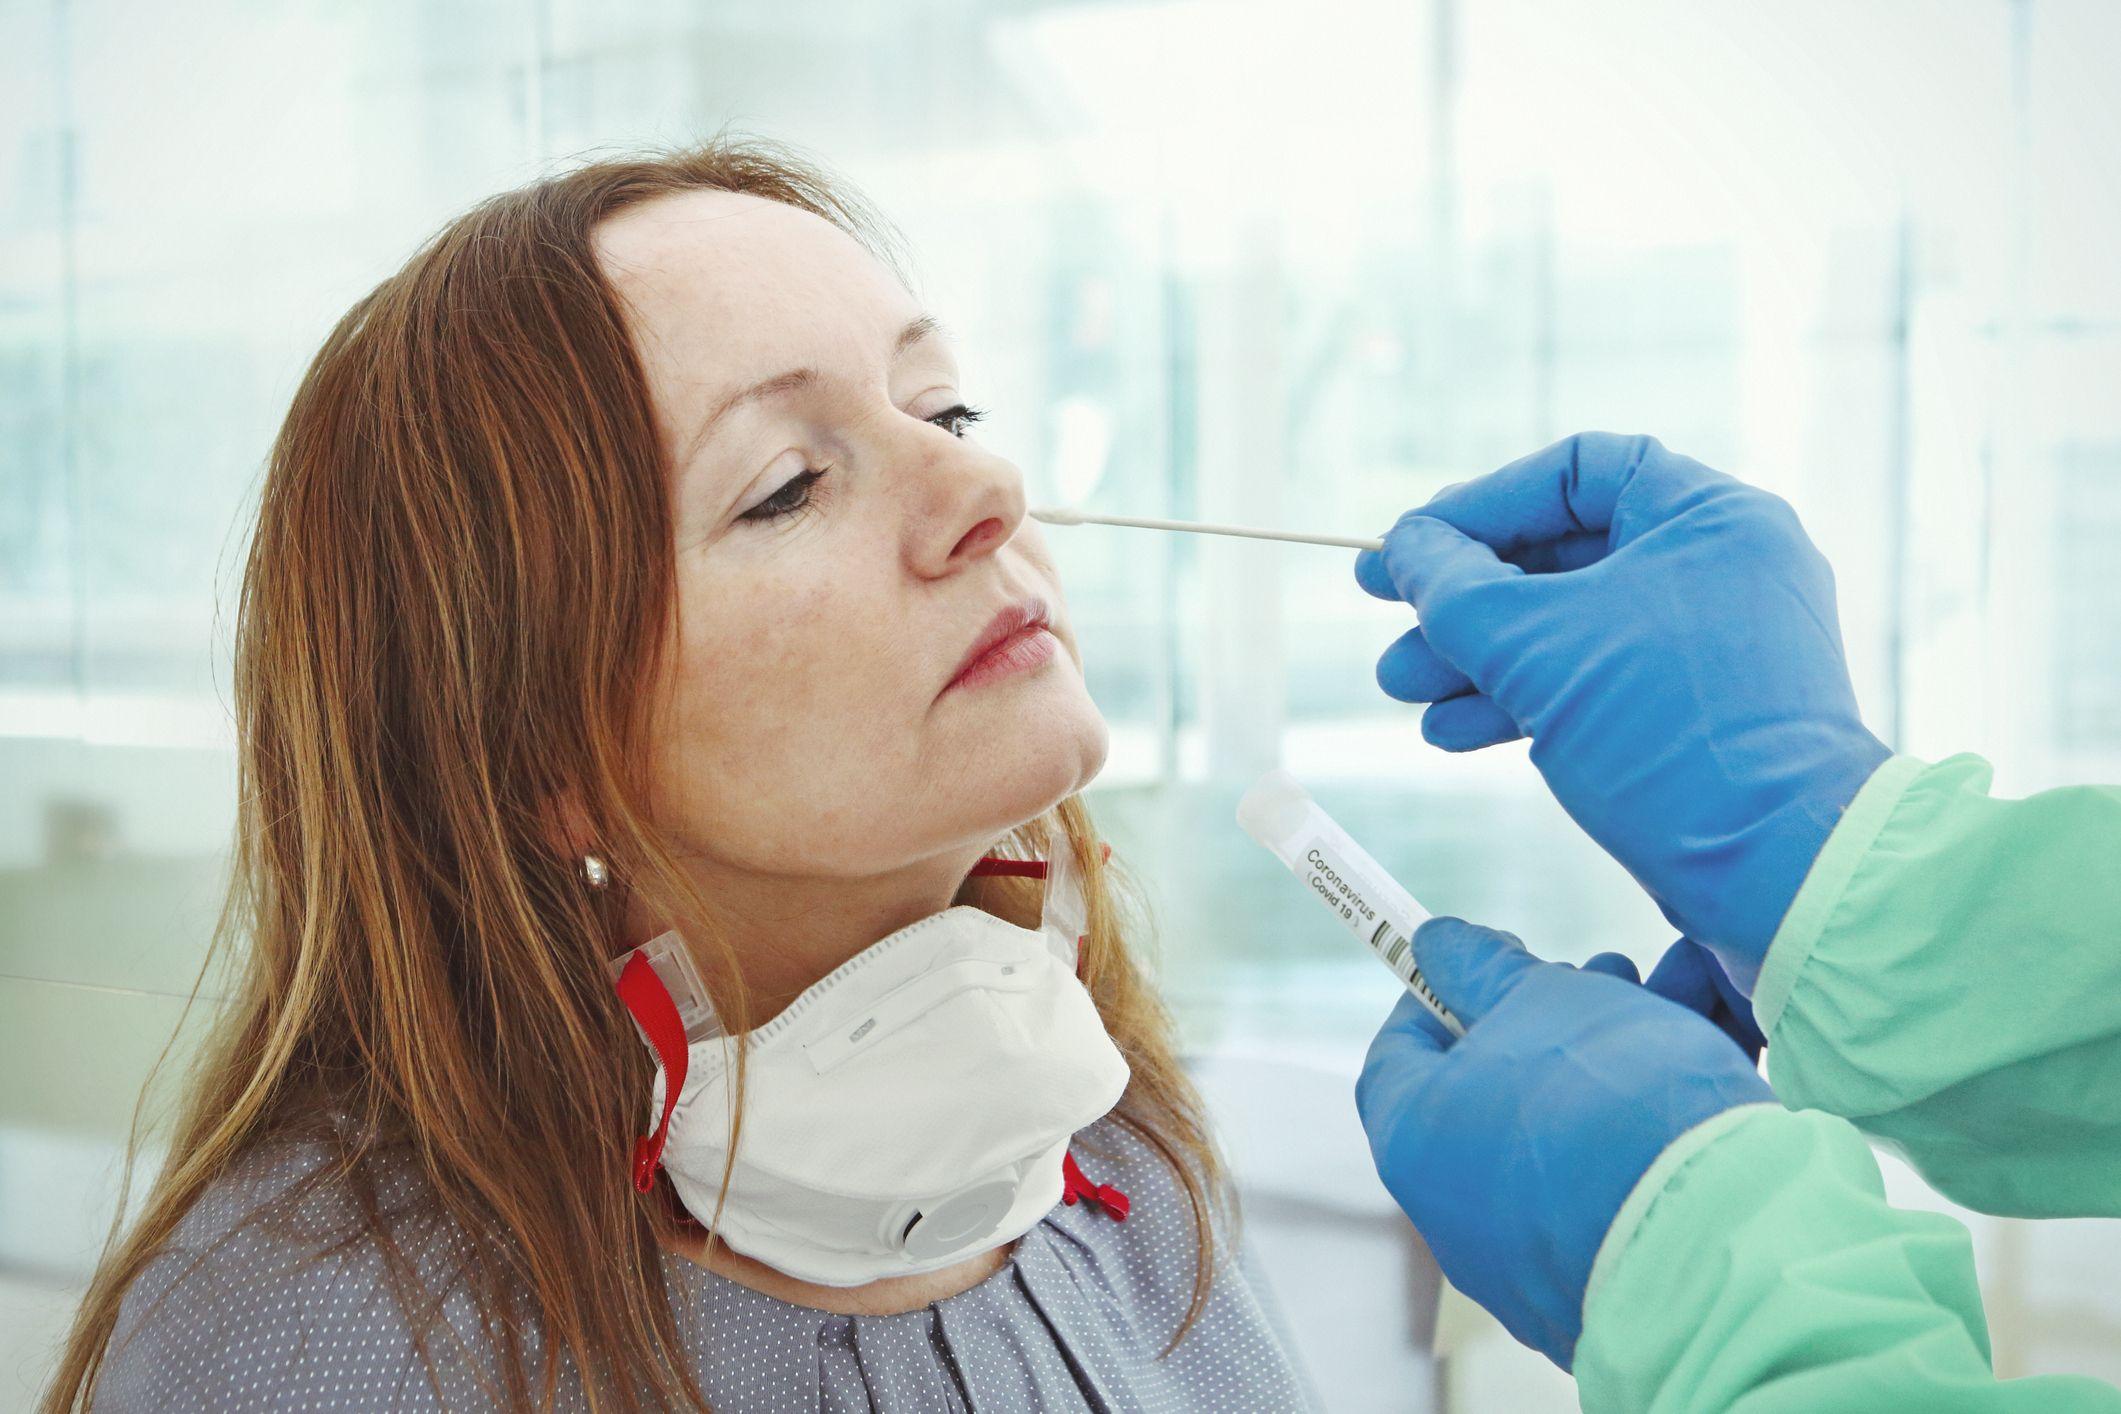 Women getting a COVID-19 test